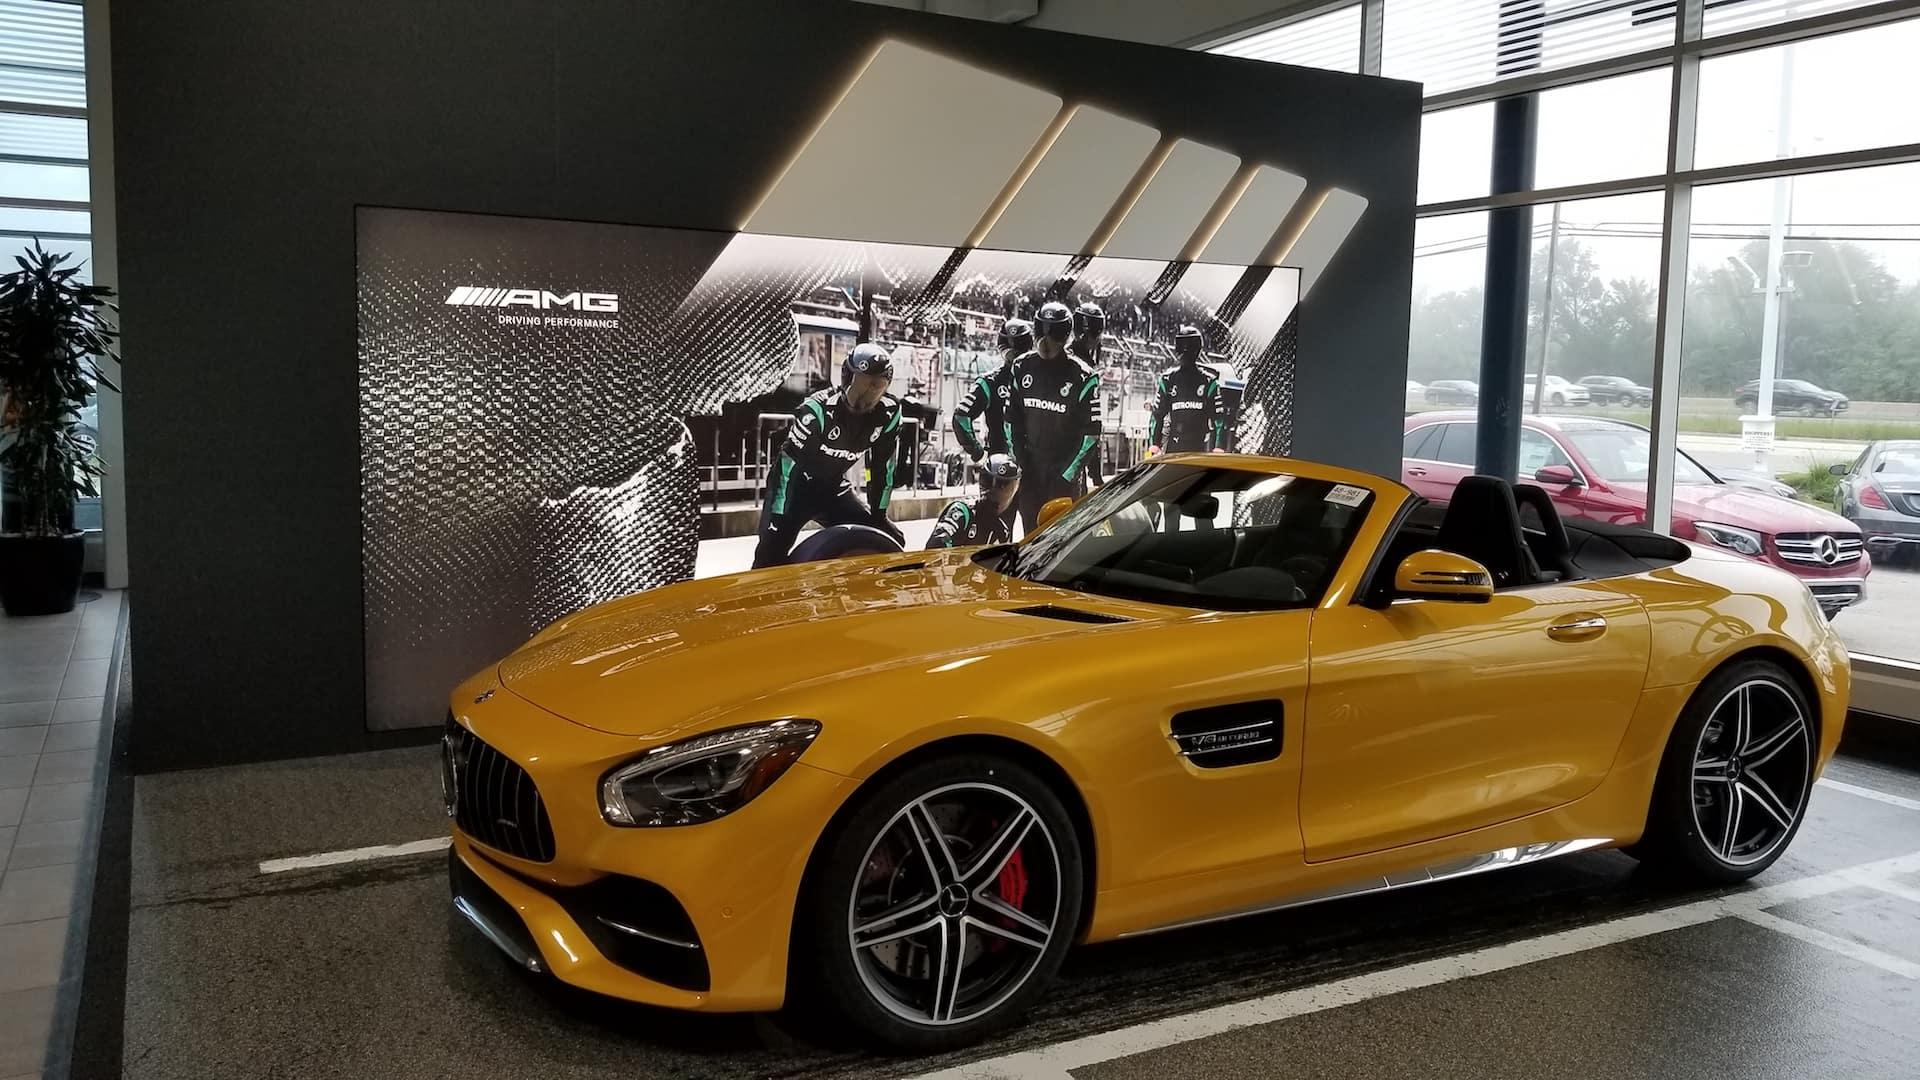 about Autohaus on Edens Mercedes-Benz Dealership